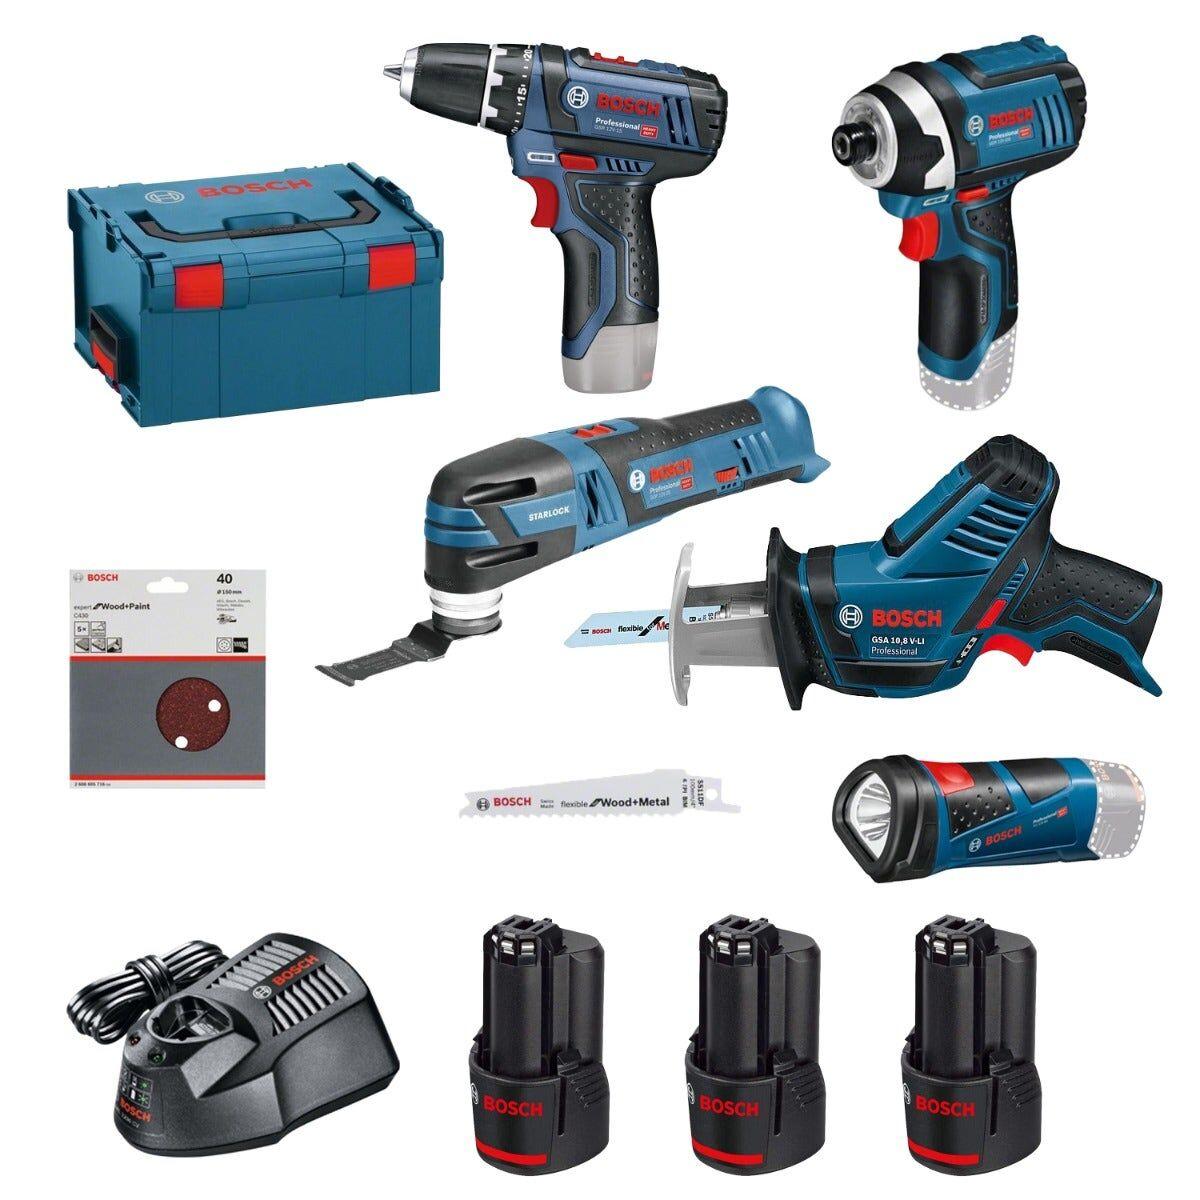 Bosch Kit 5 outils 12V : Visseuse à chocs Gdr12V-105 + Découpeur-ponceur Gop12V-28 + Perceuse-visseuse Gsr12V-15 + Scie sabre Gsa12V-14 + Lampe Gli12V-80 + chargeur rapide + 3 batteries 12V 2Ah + 5 feuilles abrasives + 2 lames de scie + coffret L-Boxx